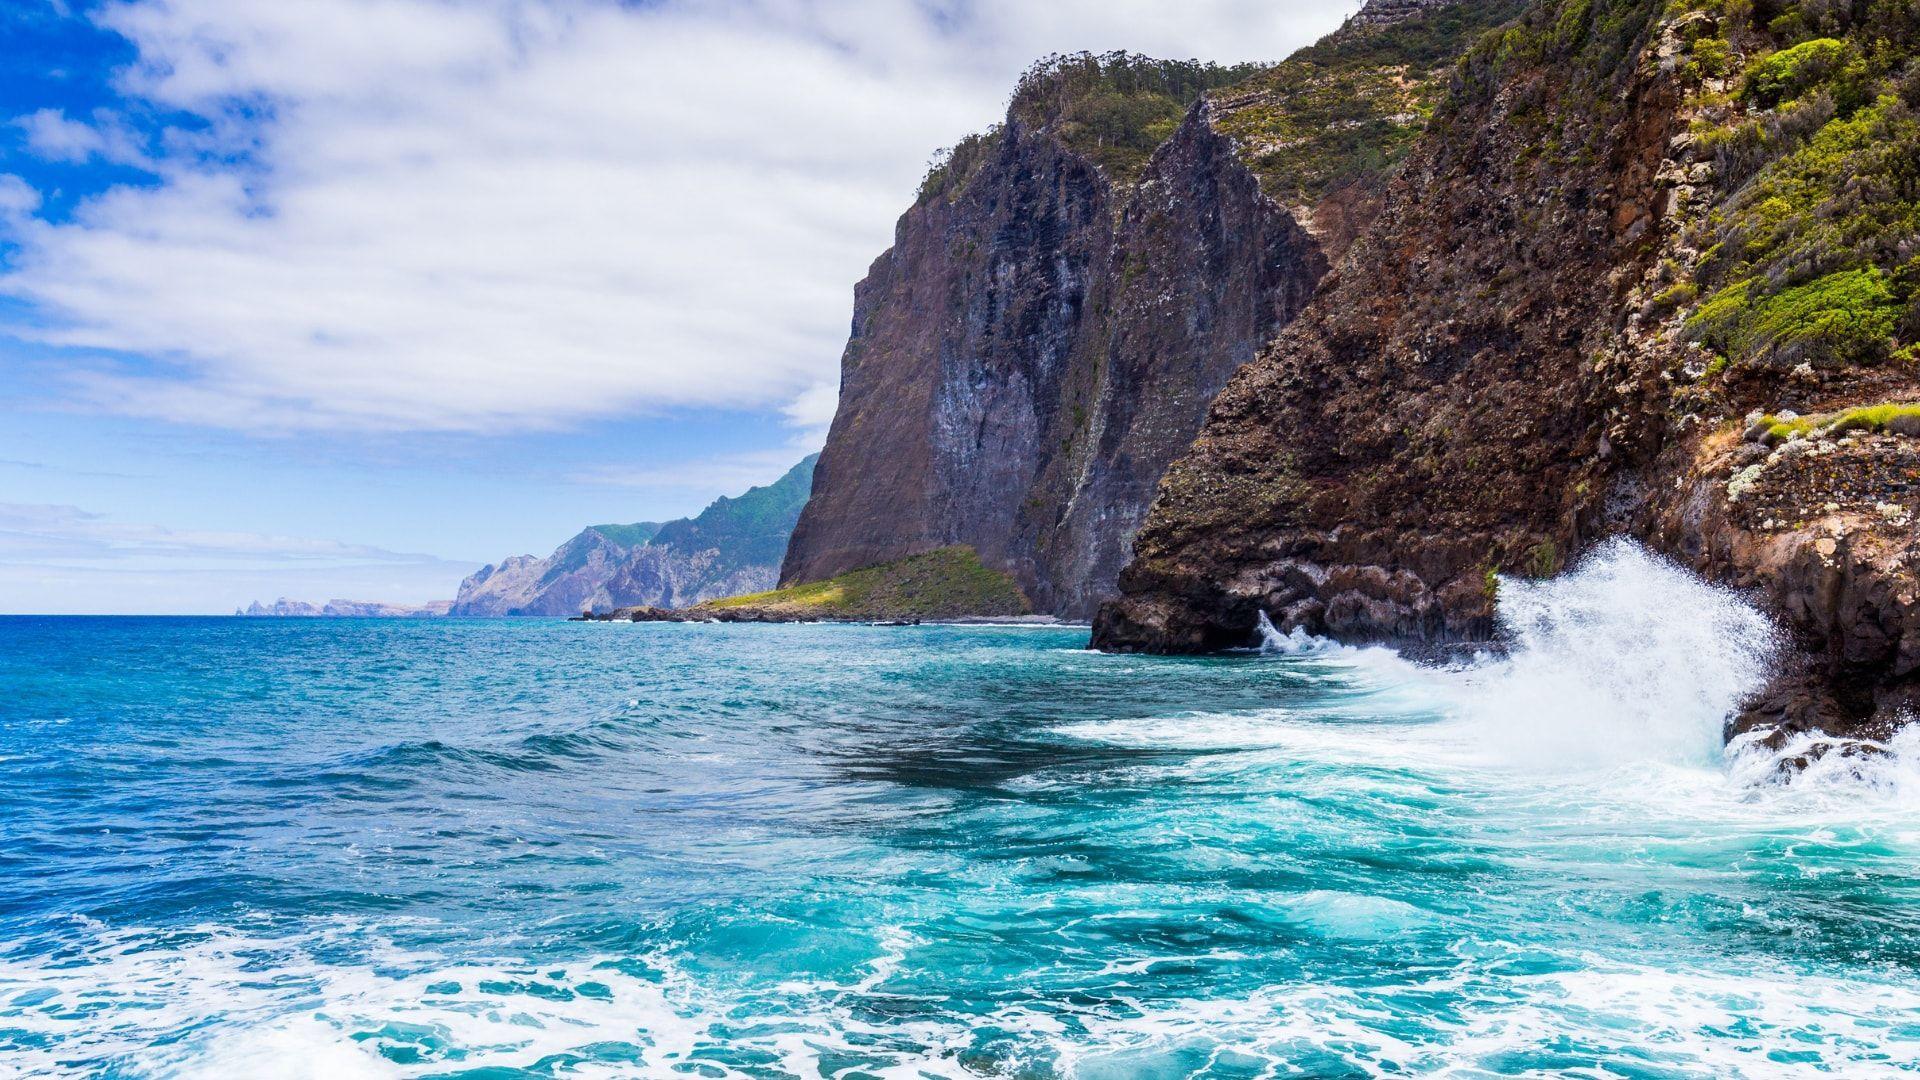 Atlanto vandenyno skalaujamos uolos